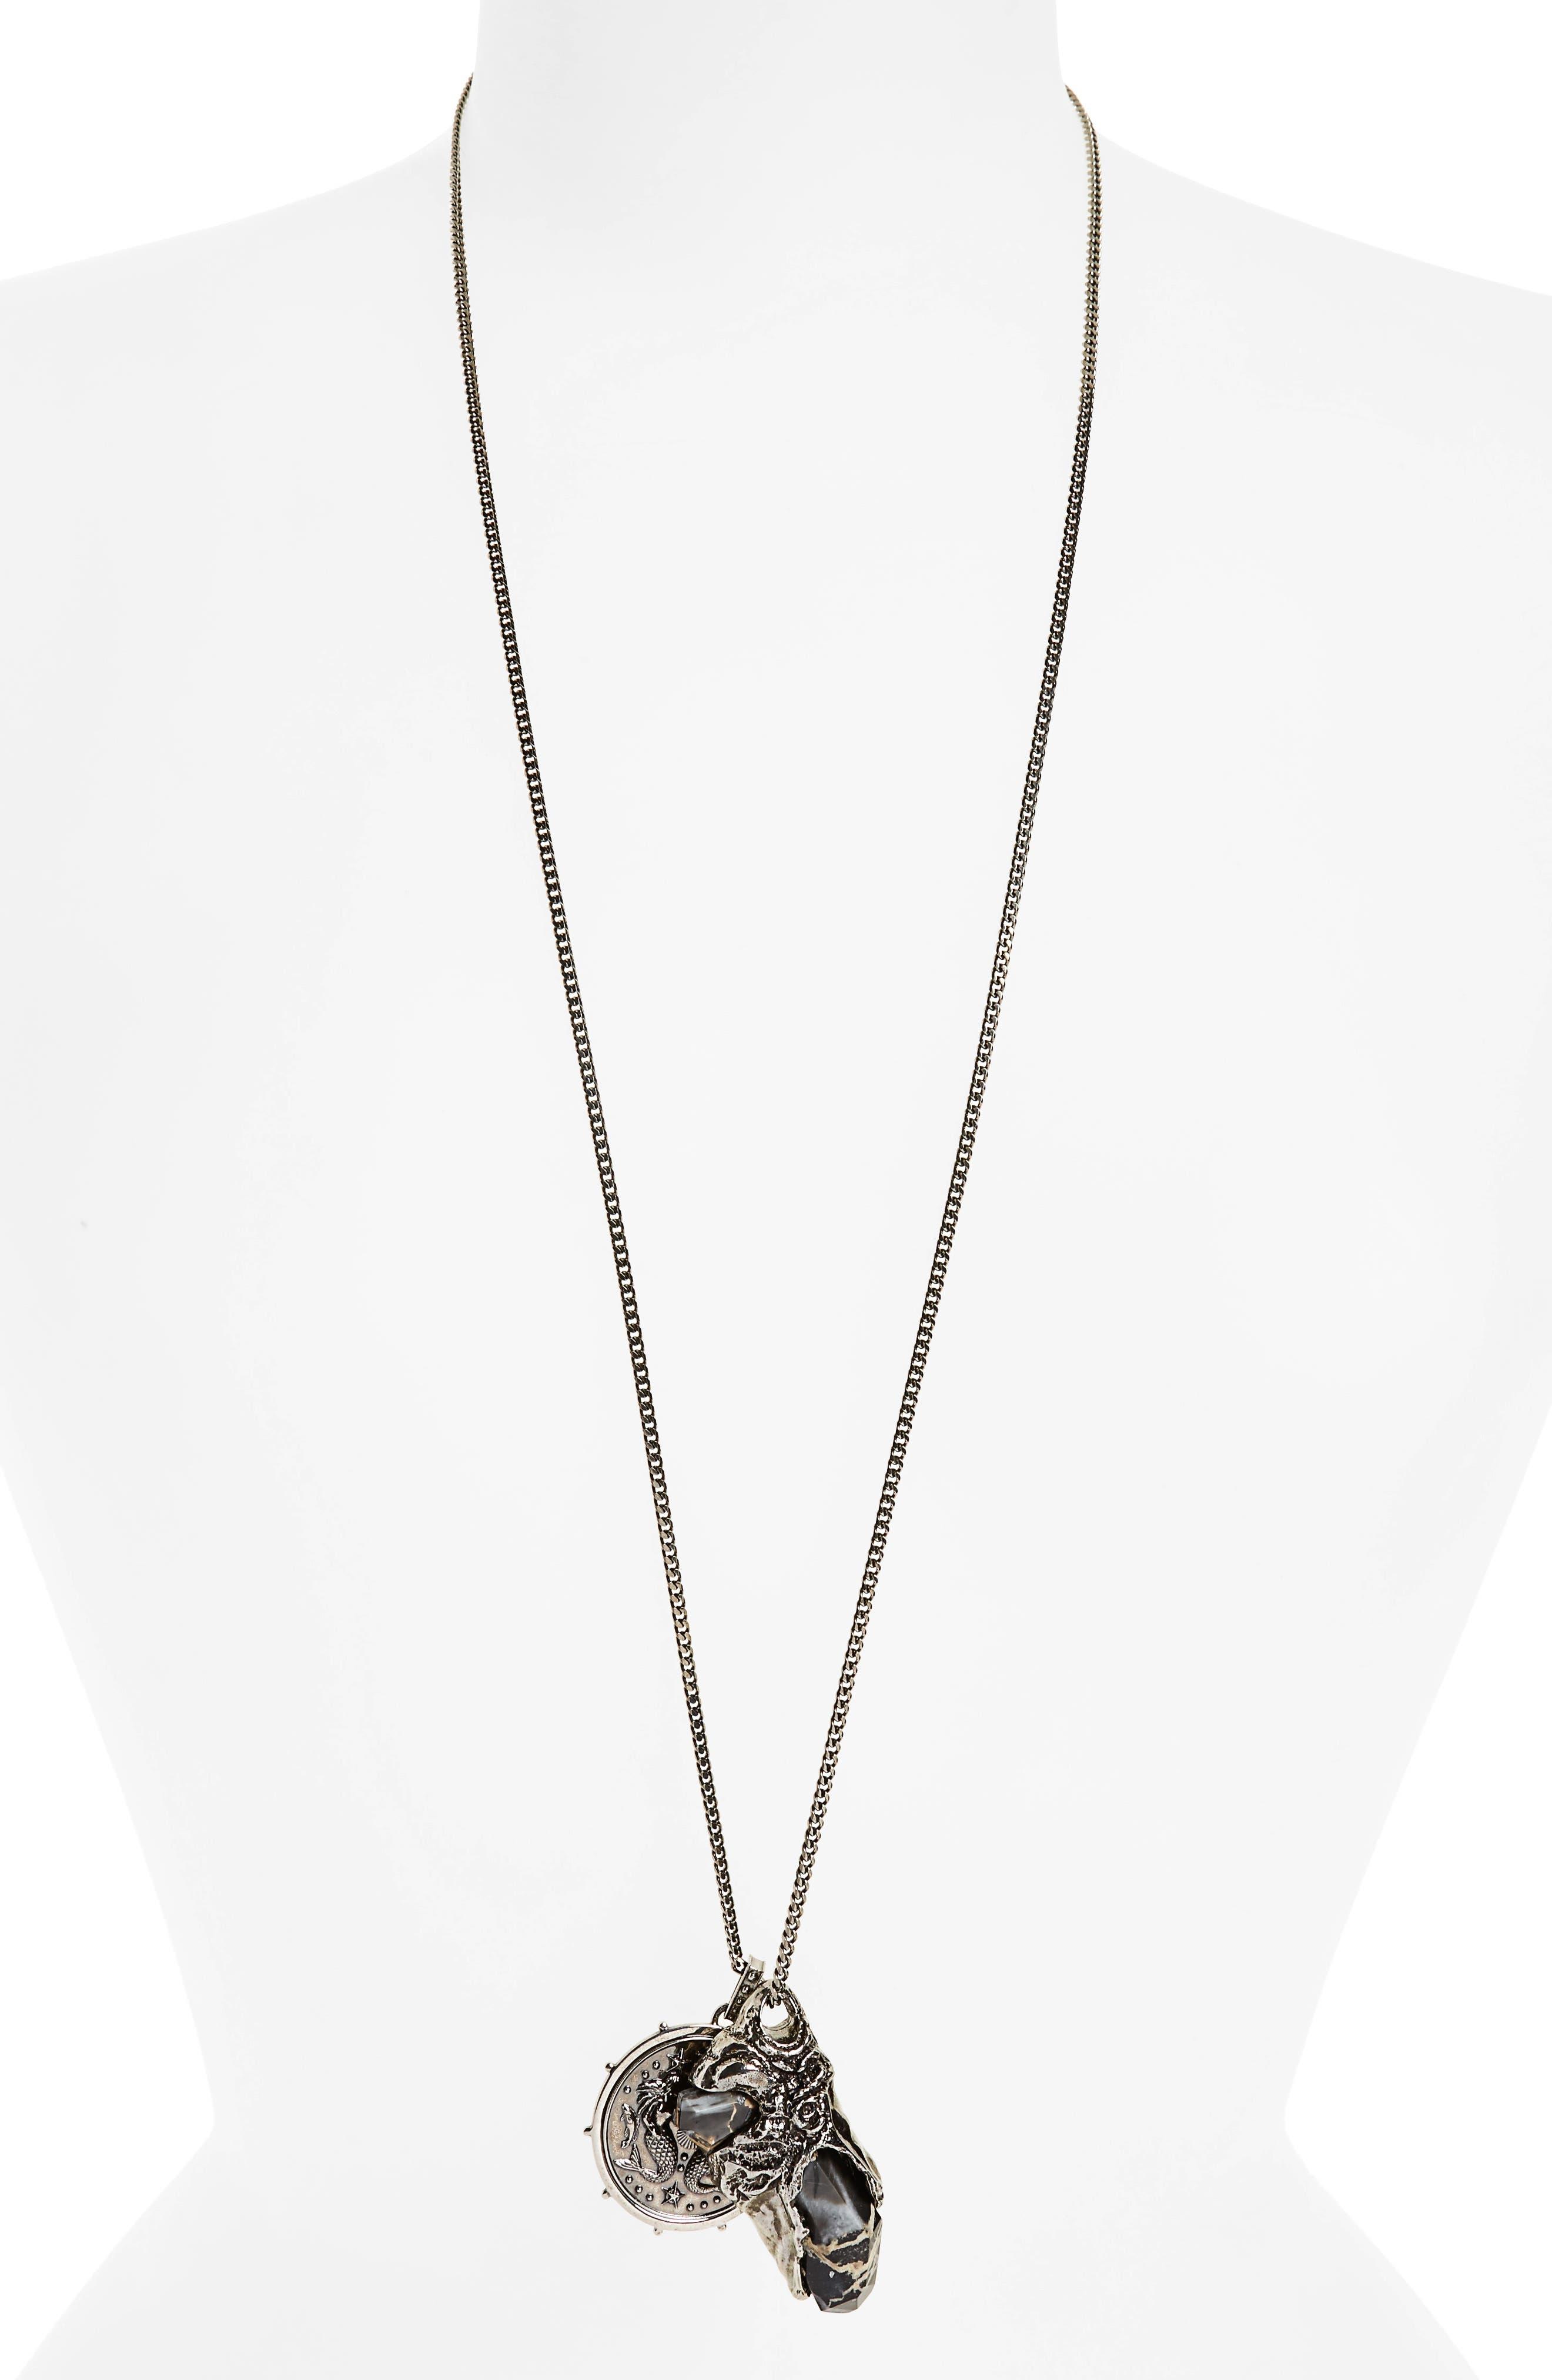 Medallion Pendant Necklace,                         Main,                         color, ANTIQUE SILVER/ BLACK PORTORO